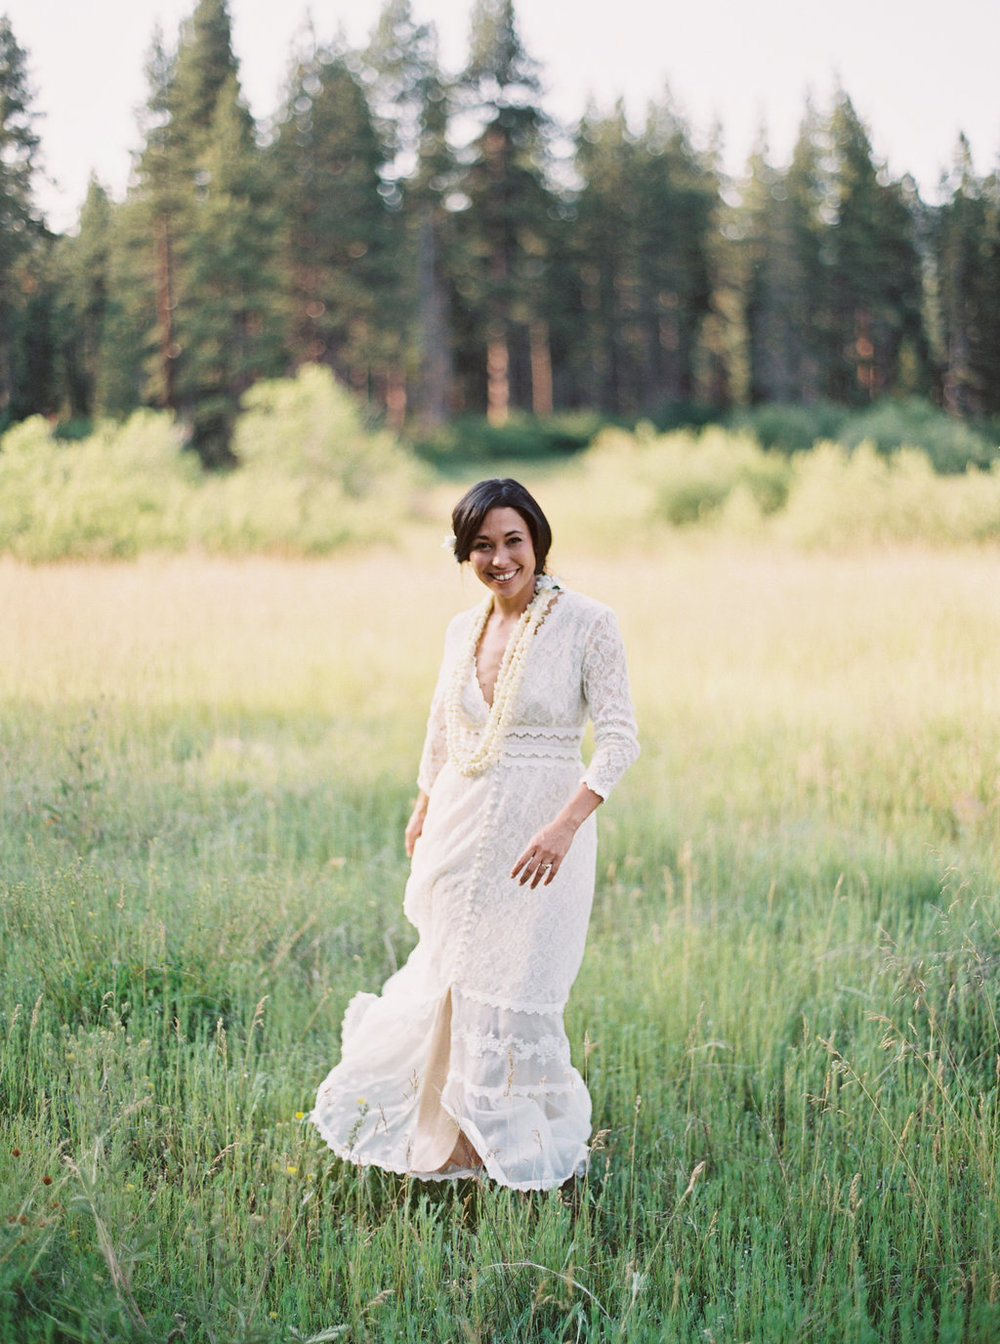 000032_gallardo_wedding_film0094.jpg